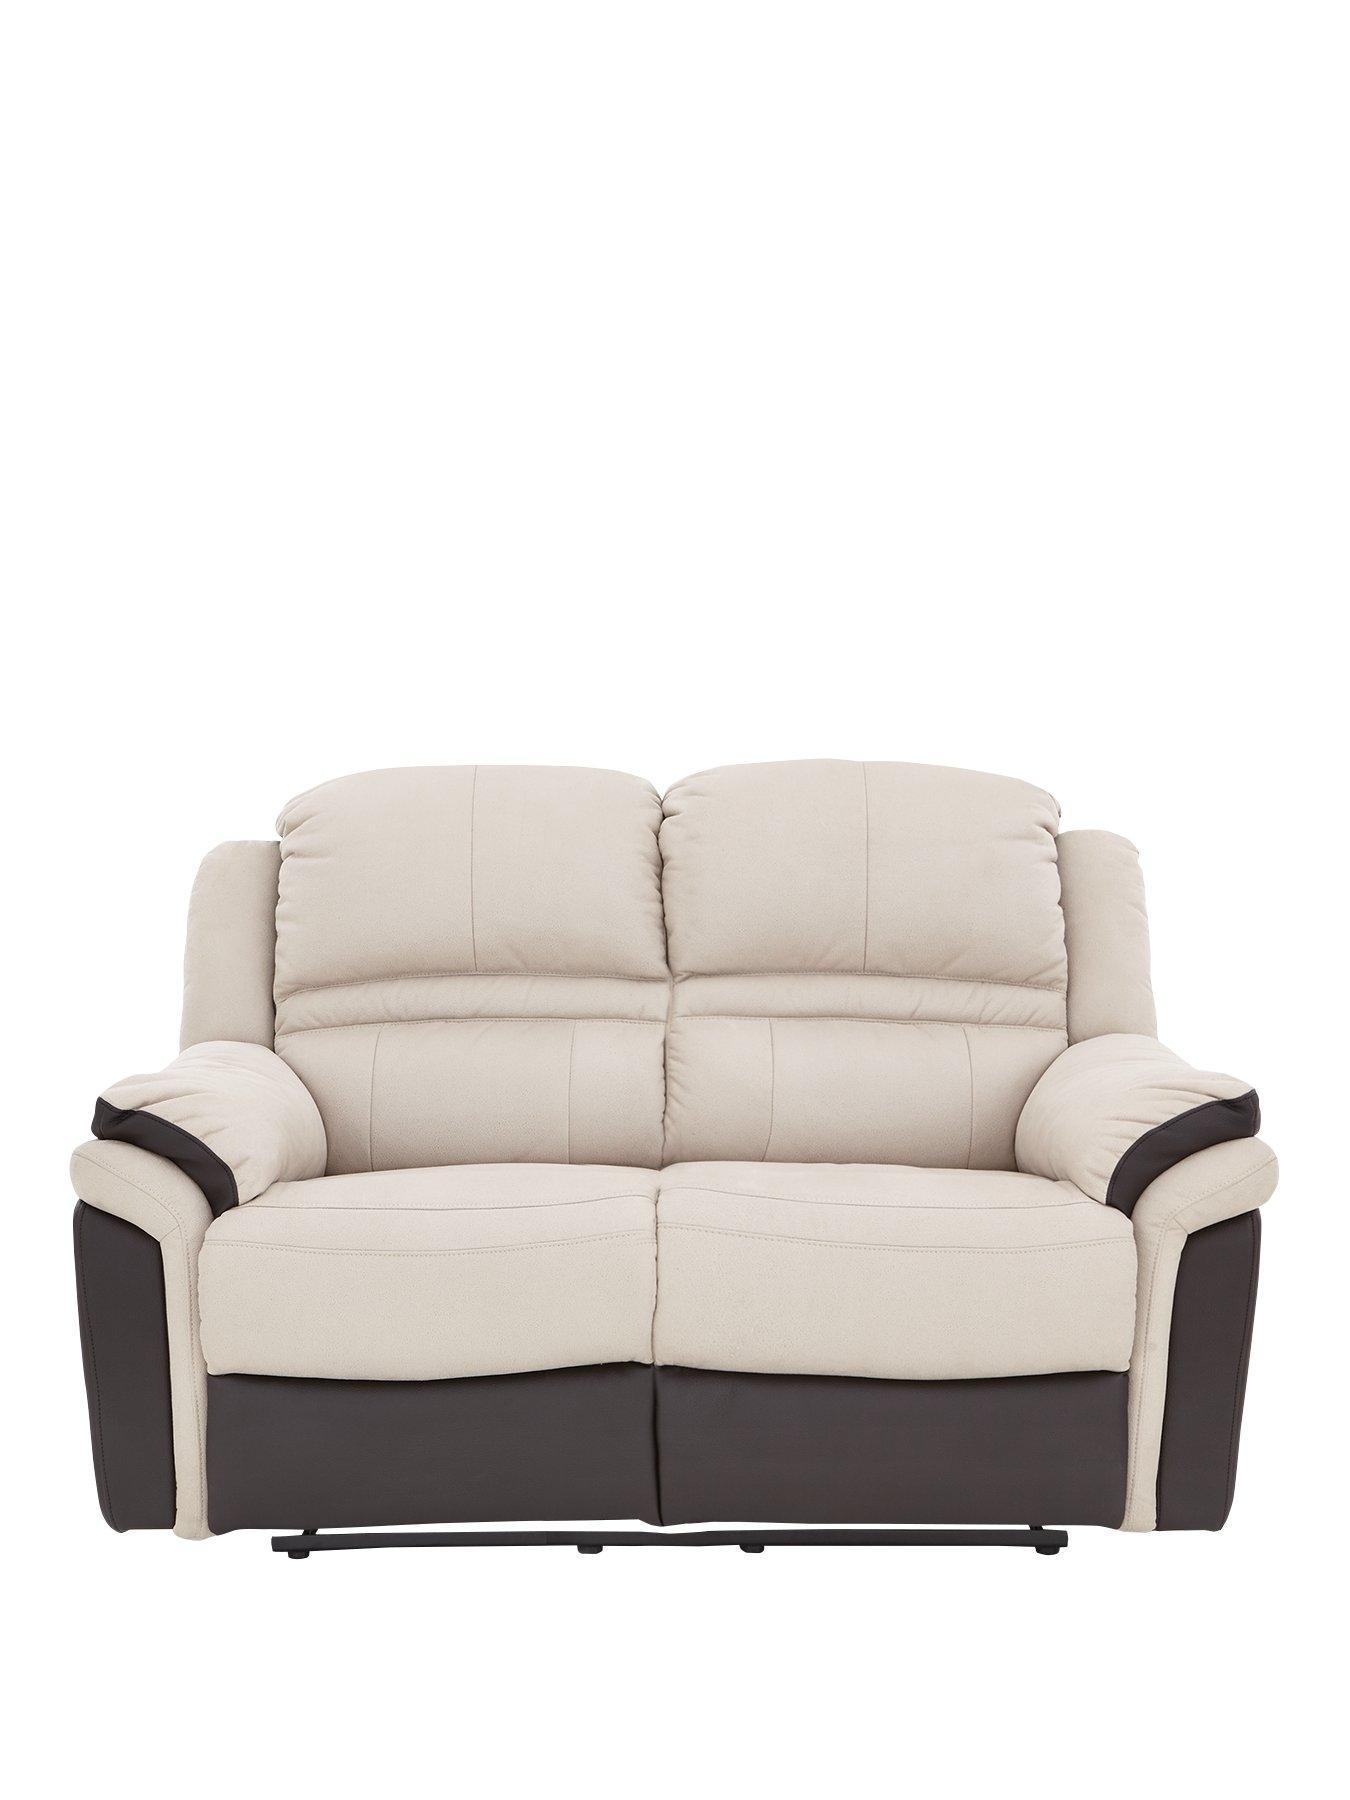 Recliner Couch Grand Slam Reclining Loveseat Grey Recliner